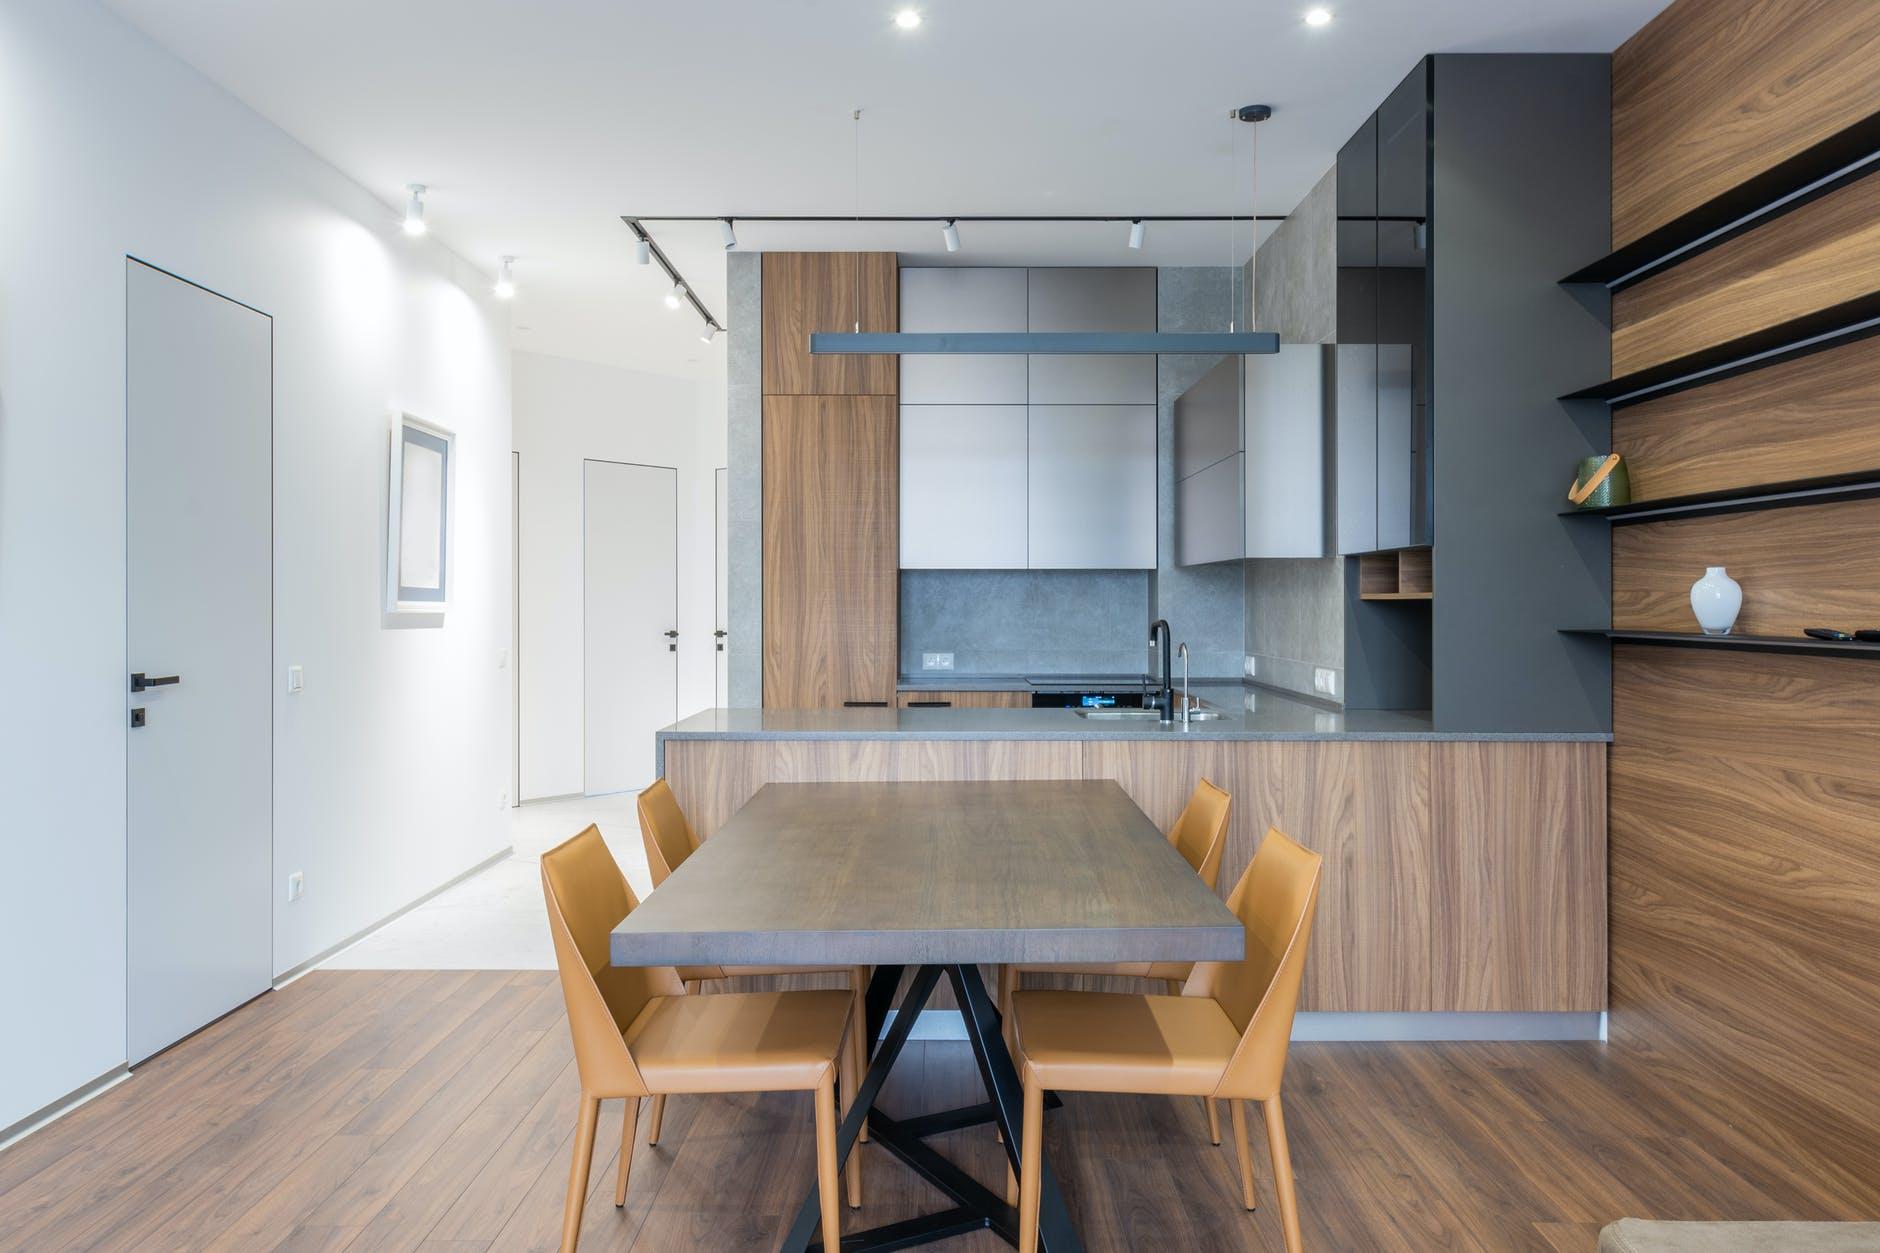 good quality kitchen flooring